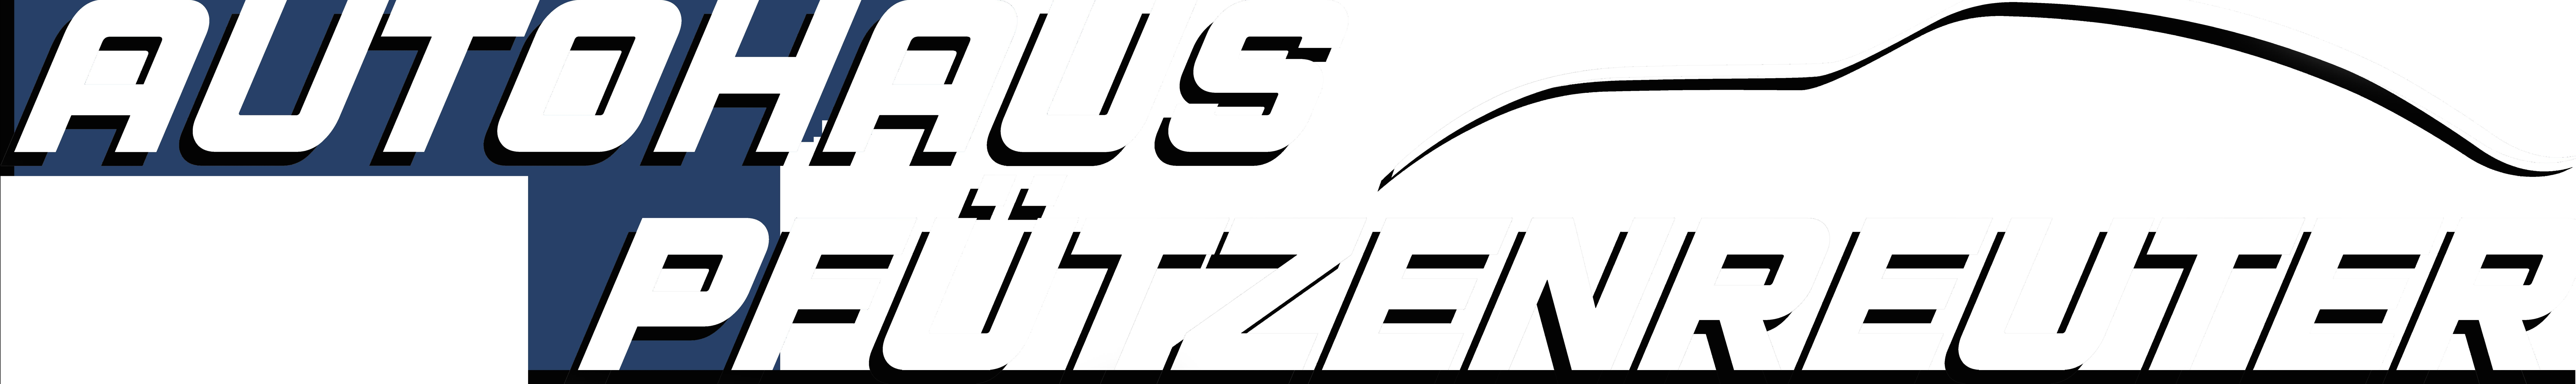 Autohaus Pfützenreuter GmbH & Co. KG